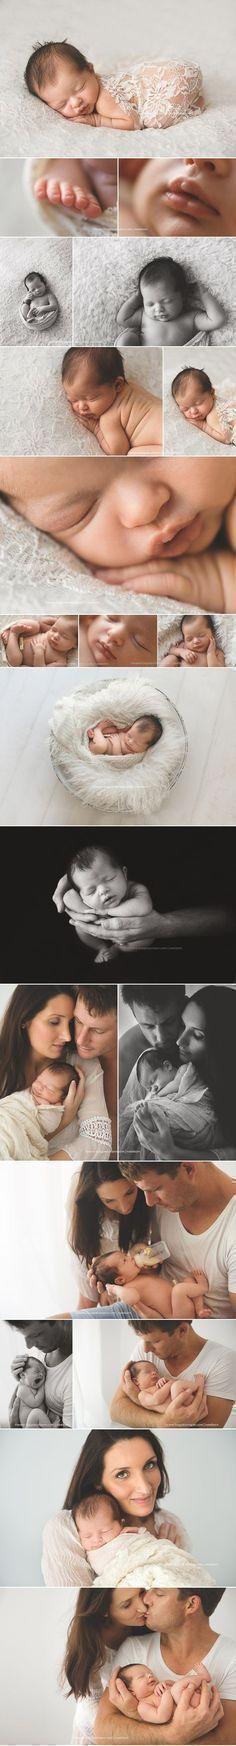 Matilda   Perth Maternity and Newborn Photographer » Perth Baby Photographer Lisa Goessmann Modern Photography Newborn Photography babies and pregnancy #maternityphotography #pregnancyphotography